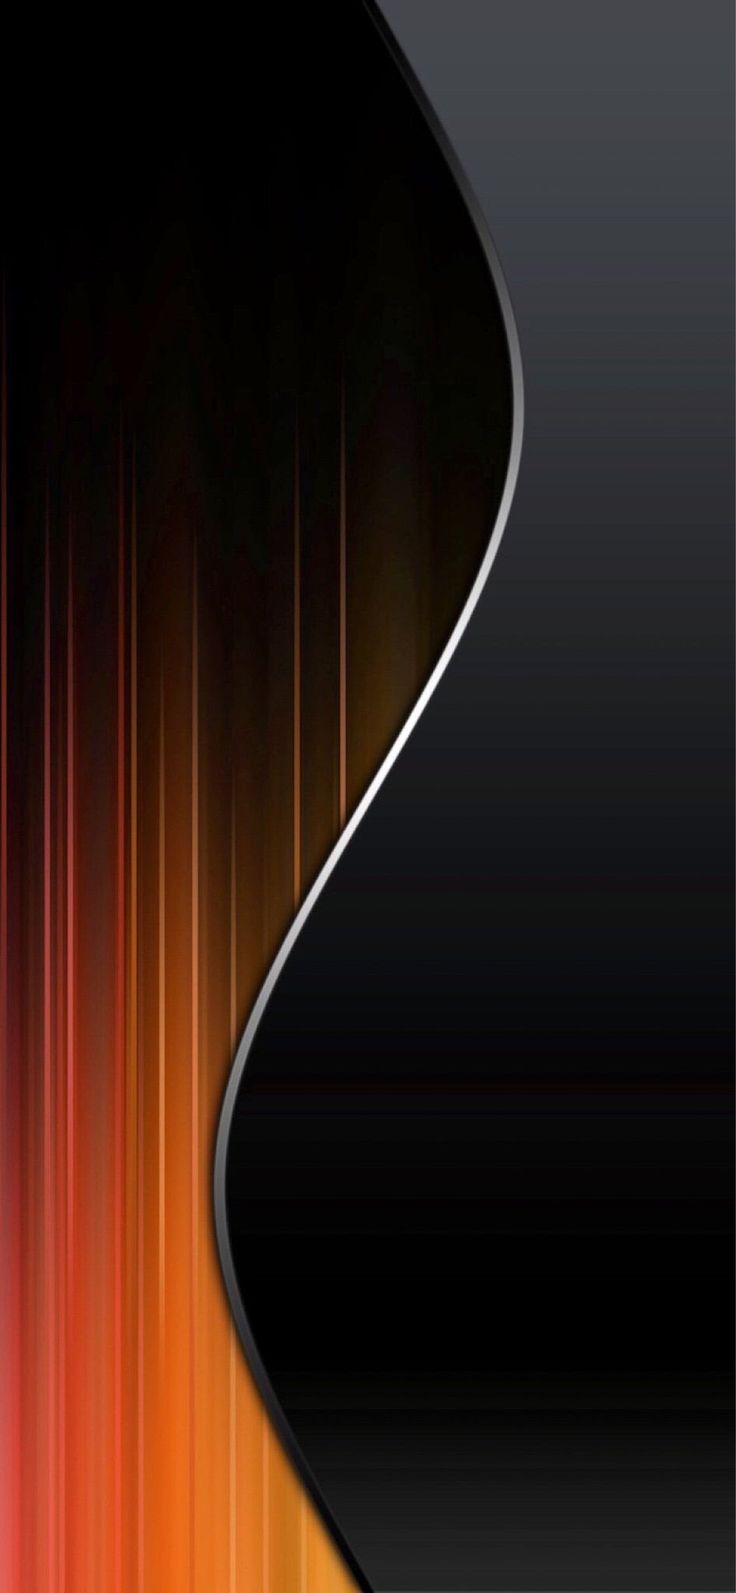 Pin de Peter J en Pantalla | Cellphone wallpaper, Wallpaper y Iphone wallpaper